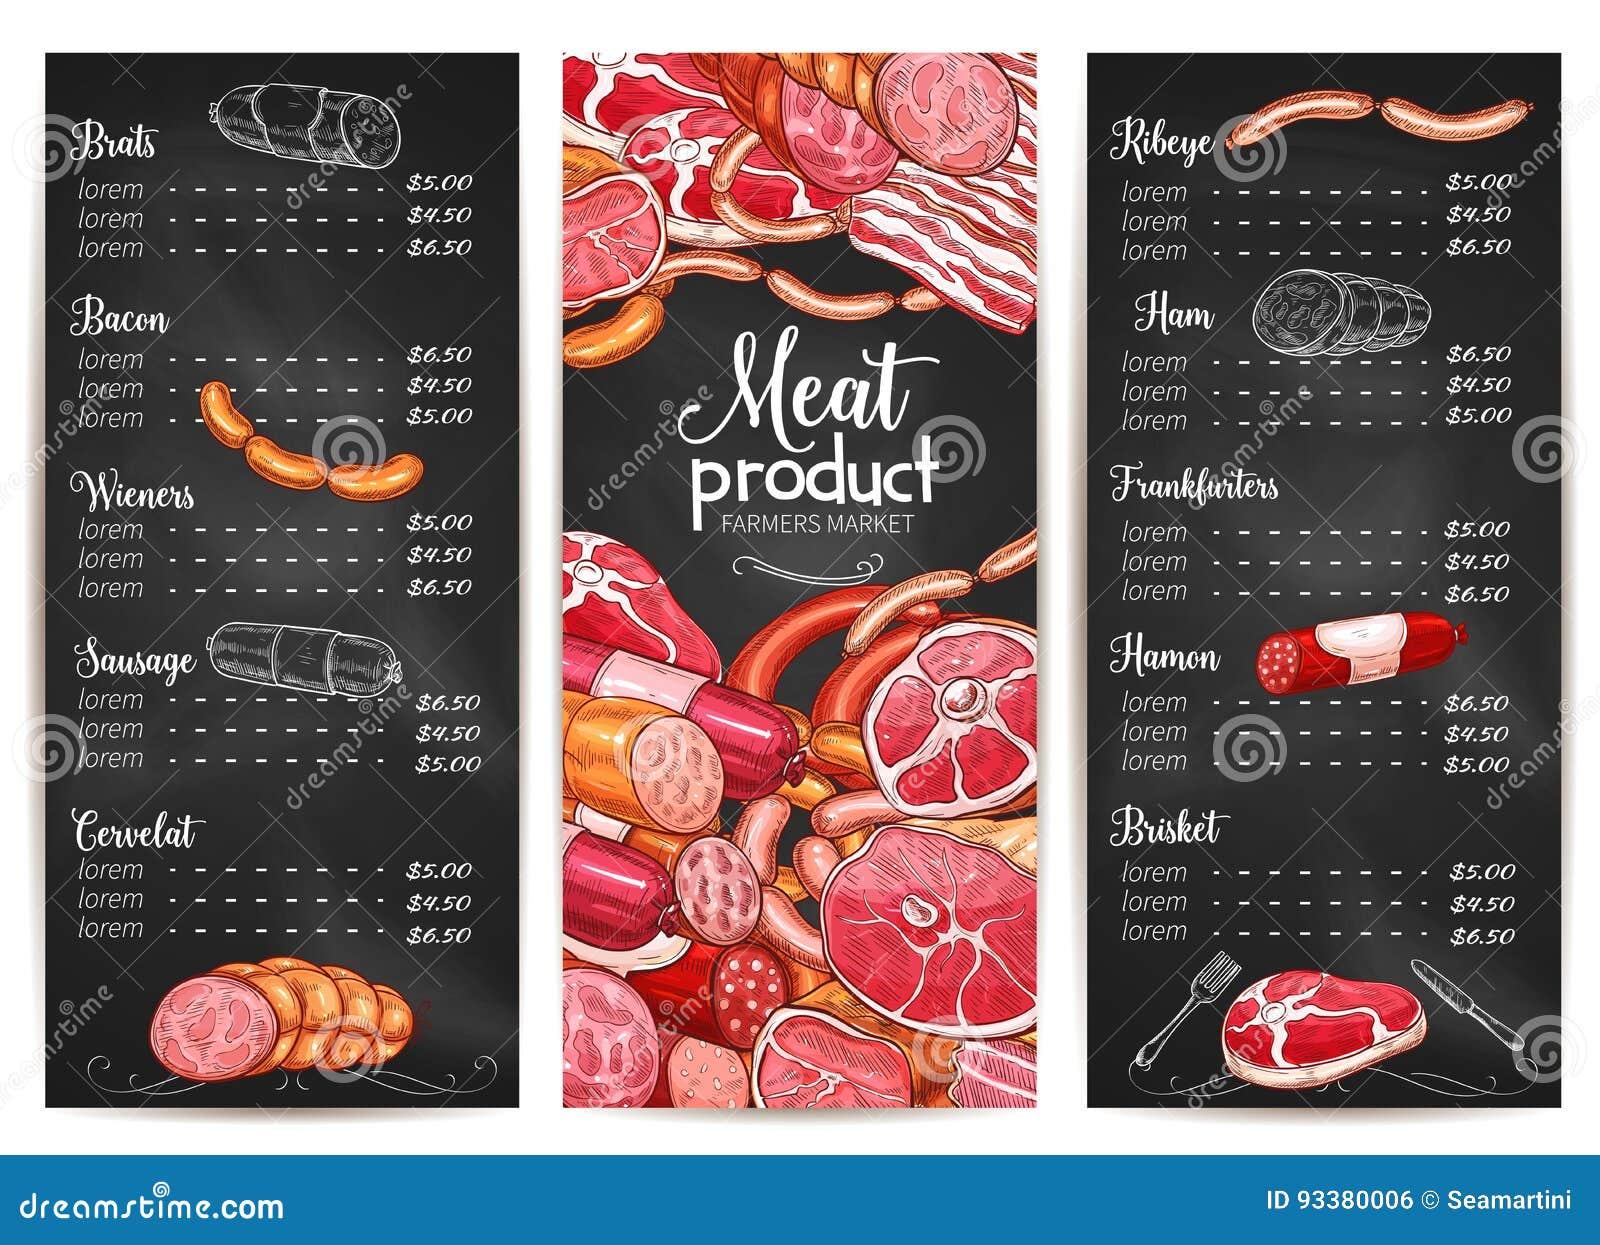 Meat Market Restaurant Menu